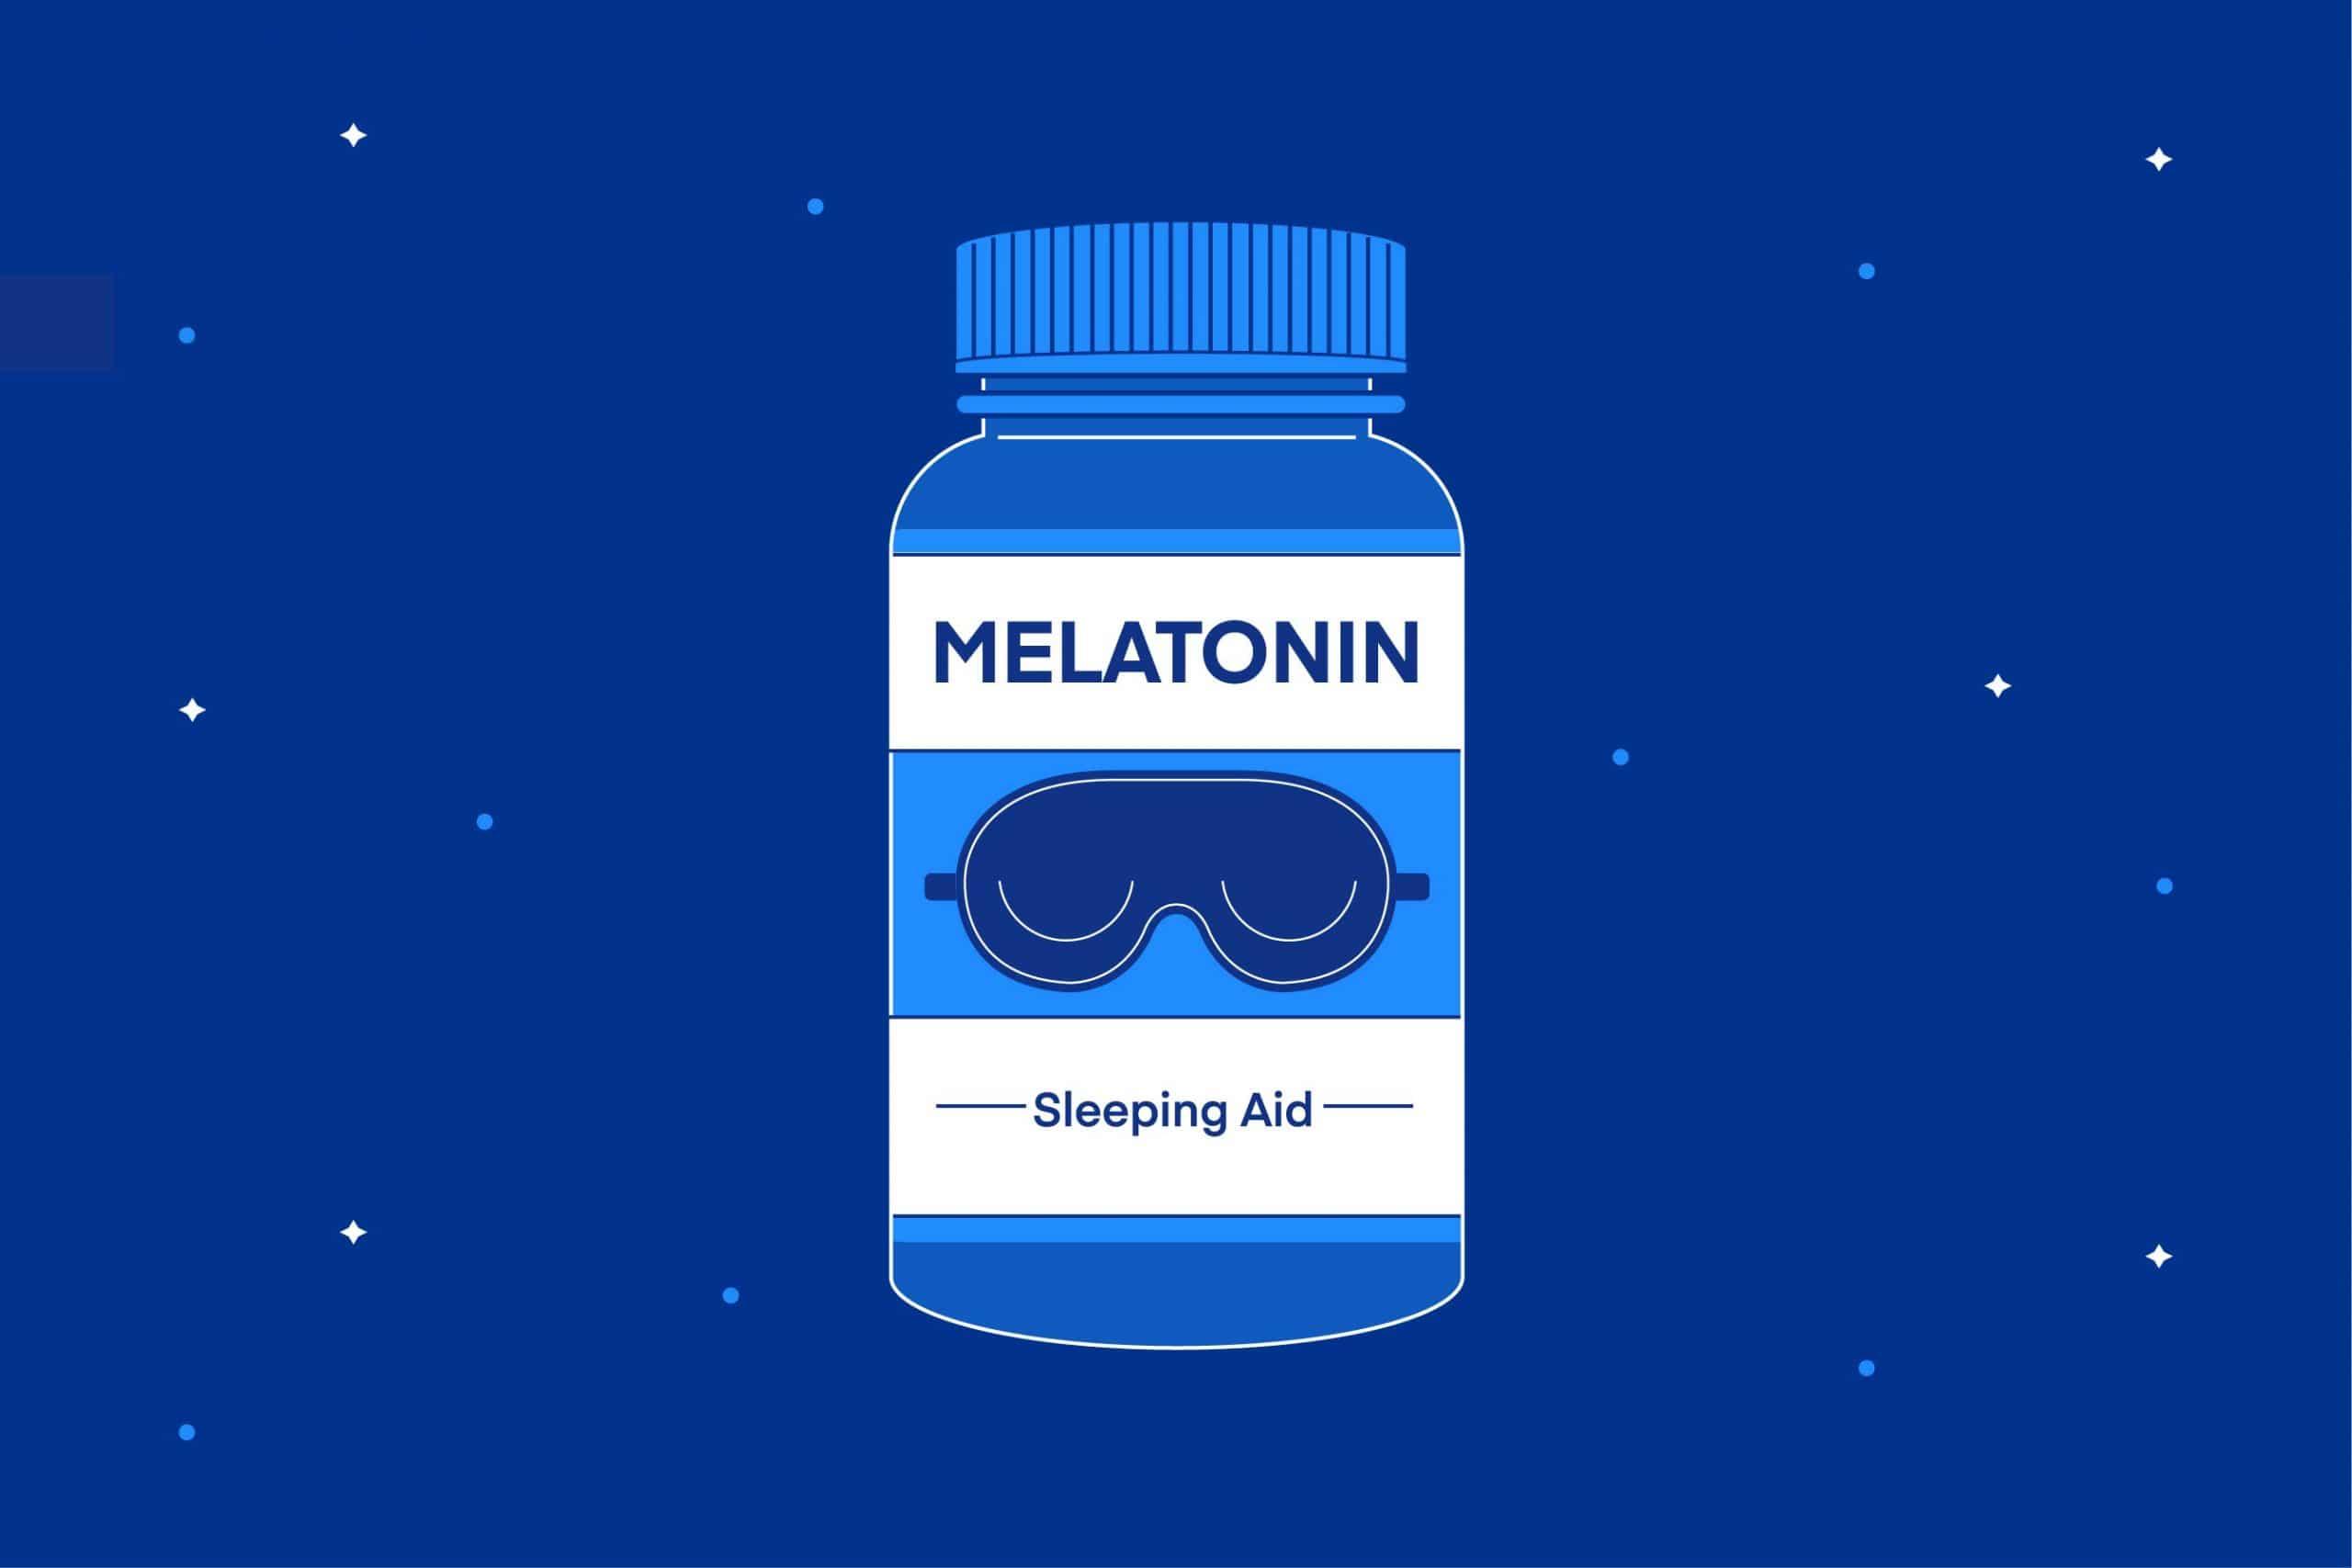 Can You Overdose on Melatonin?